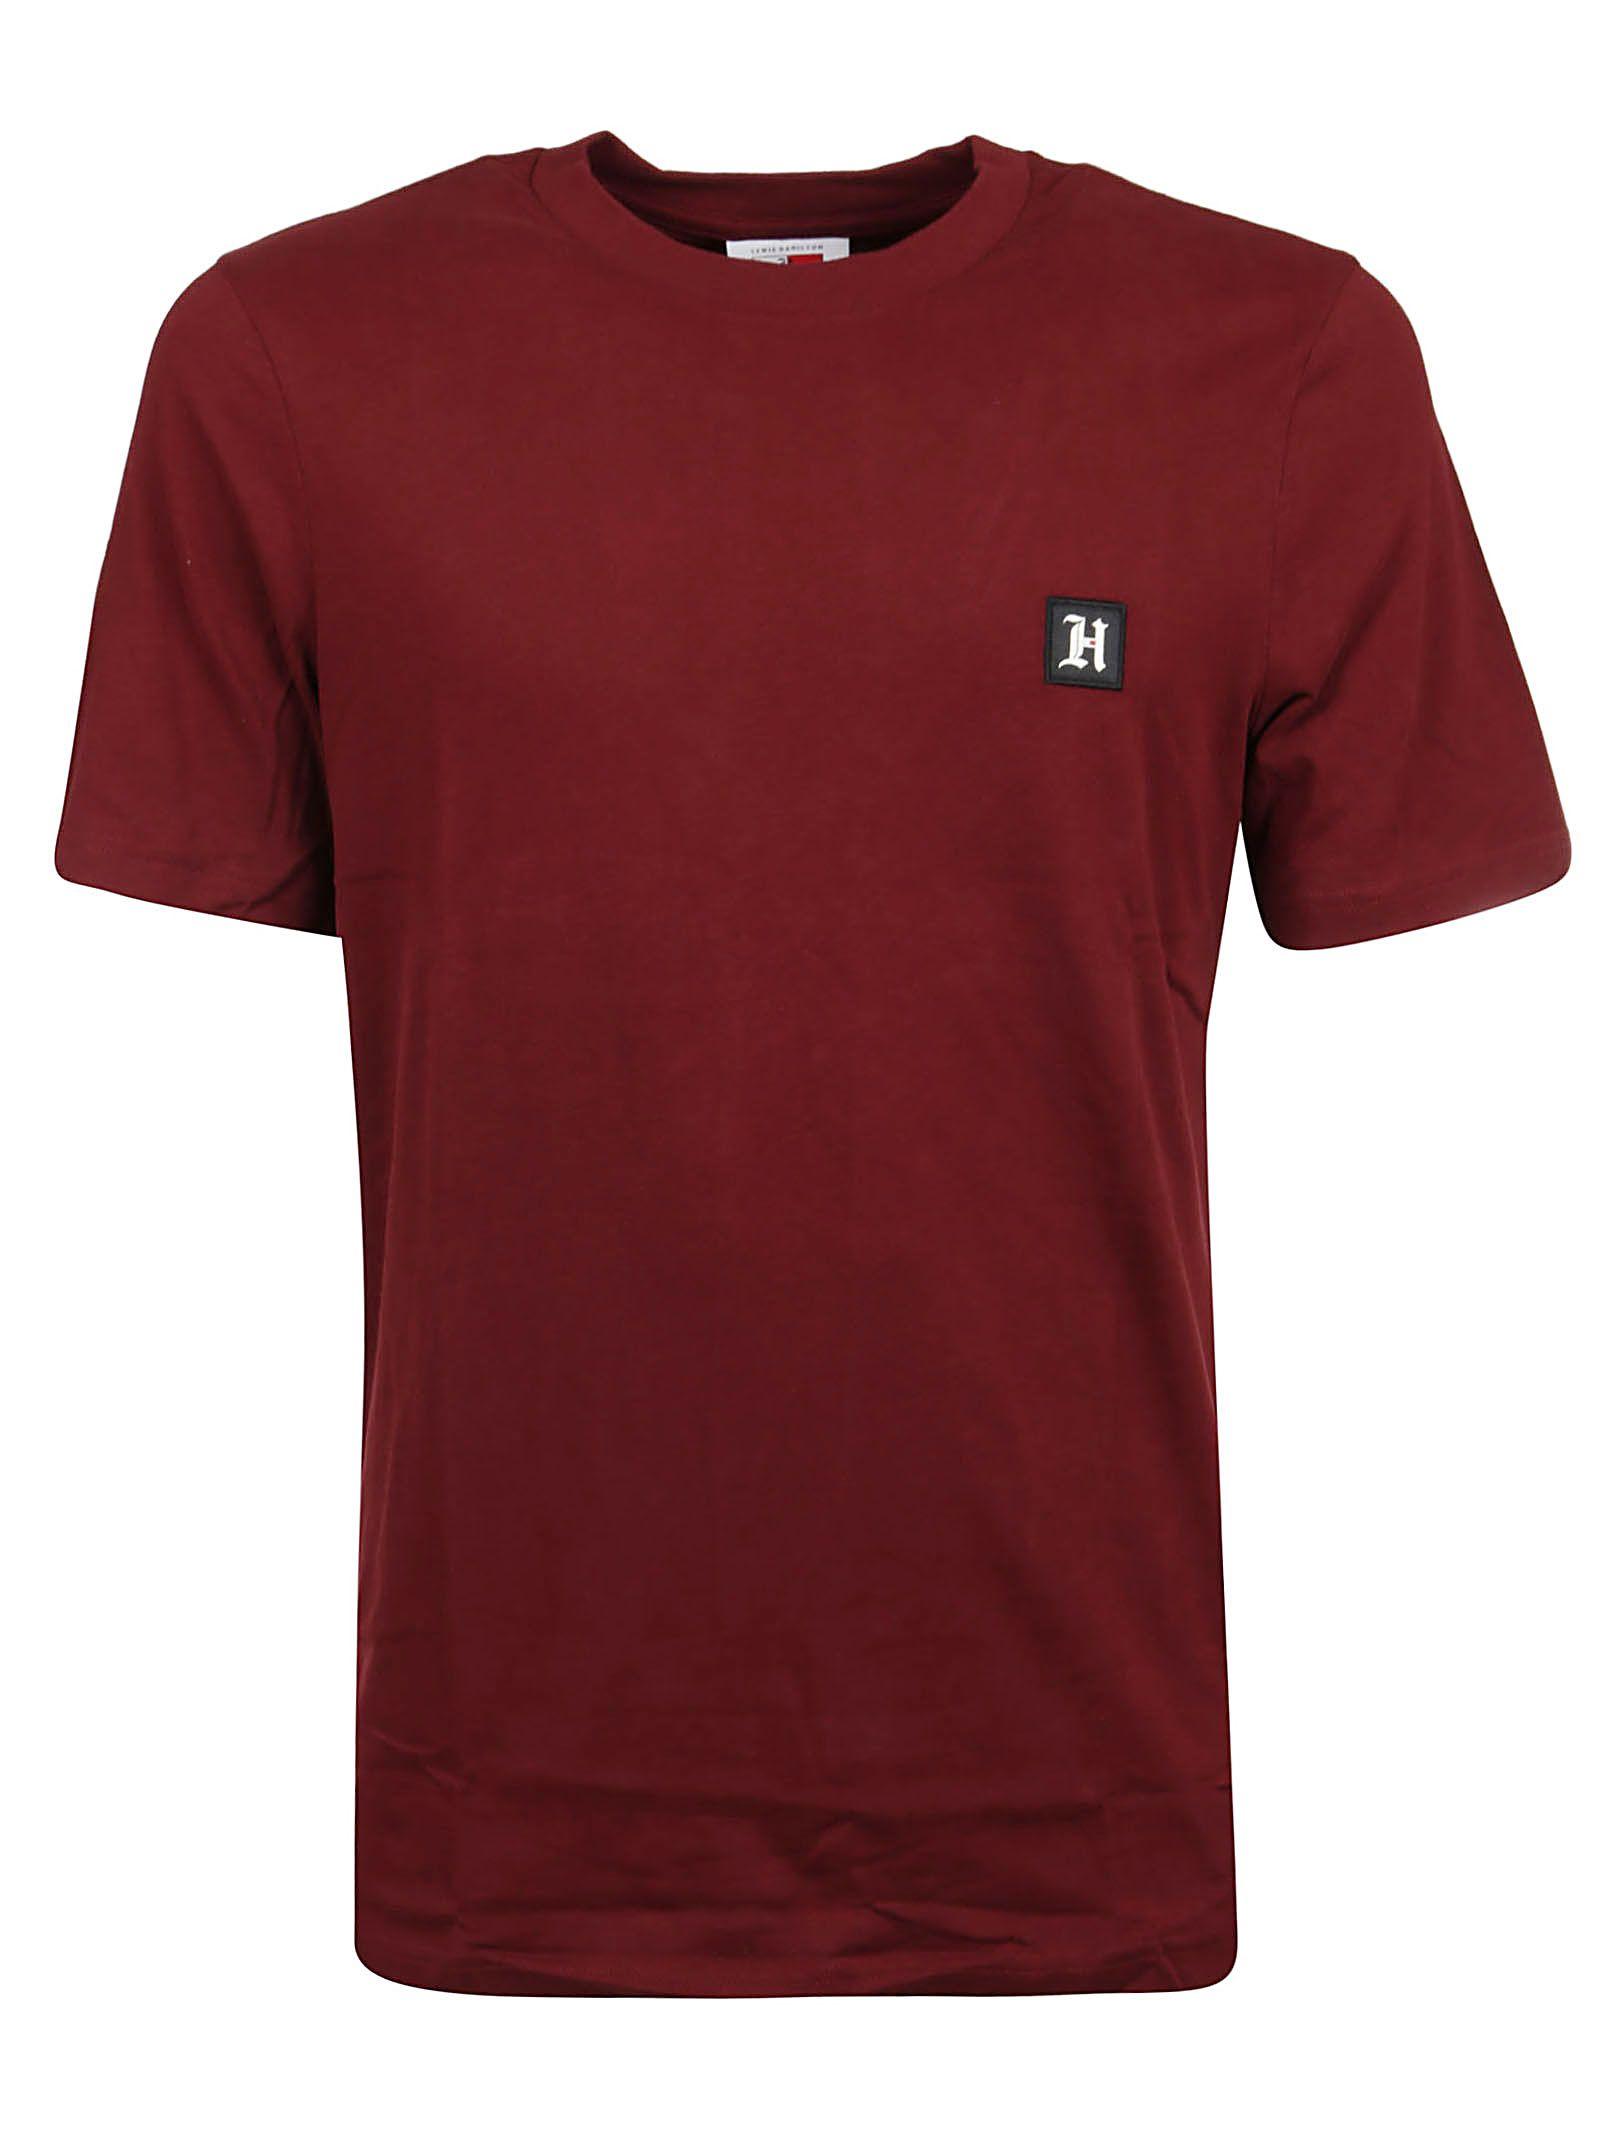 Tommy Hilfiger Burgundy Cotton T-shirt